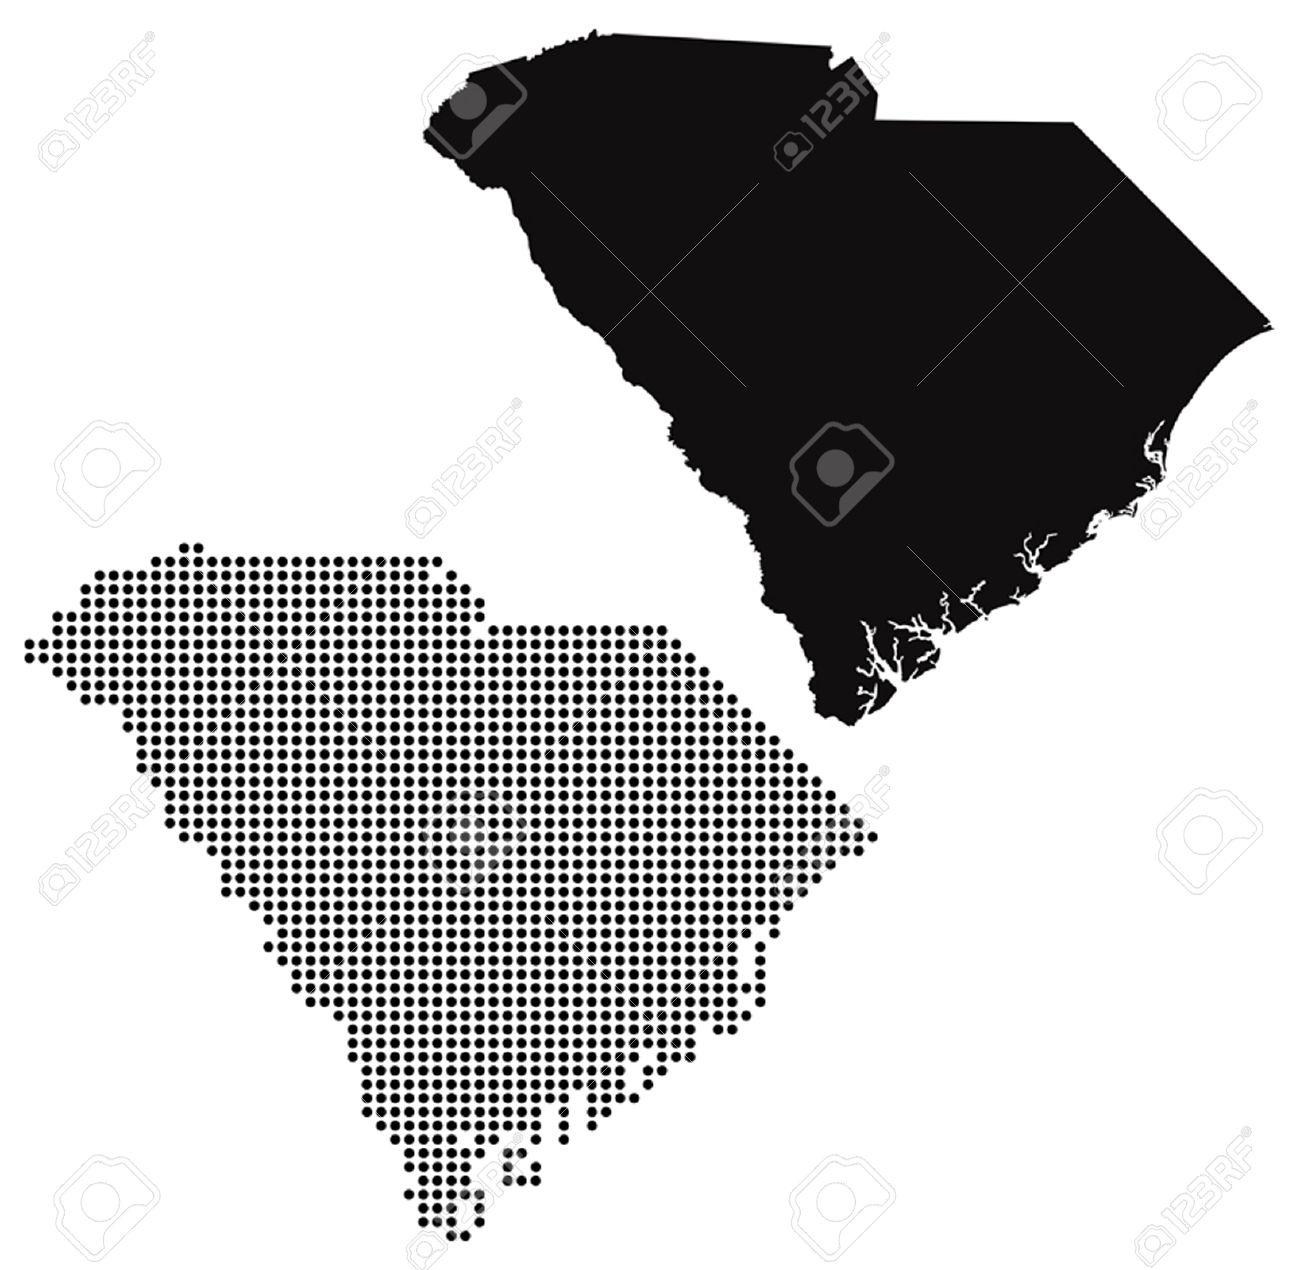 Usa Map Silhouette Silhouette Map Usa Handwritten Names - Tnt5902 us map